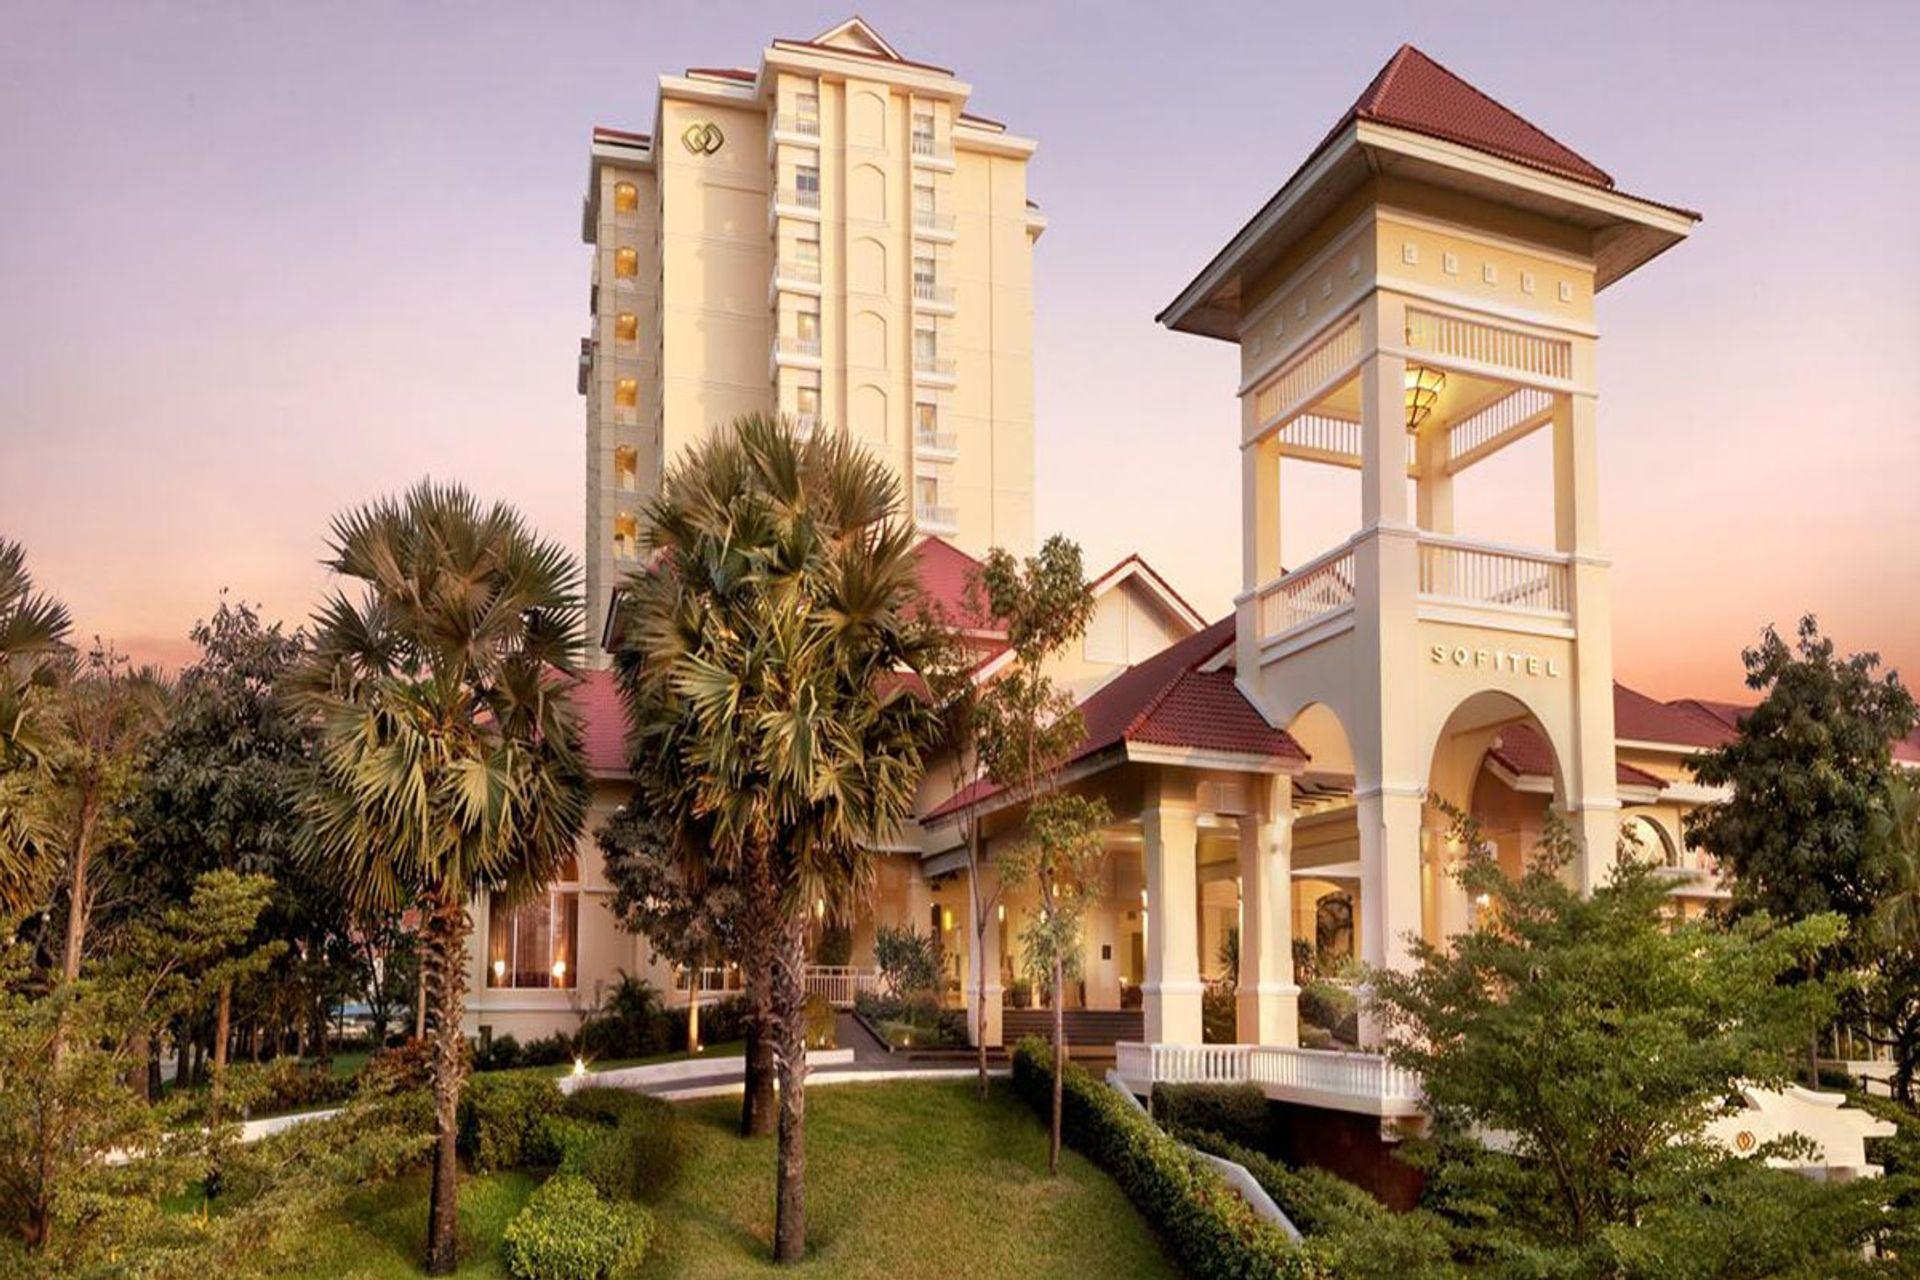 Khách sạn Sofitel Phnom Penh Phokeethra